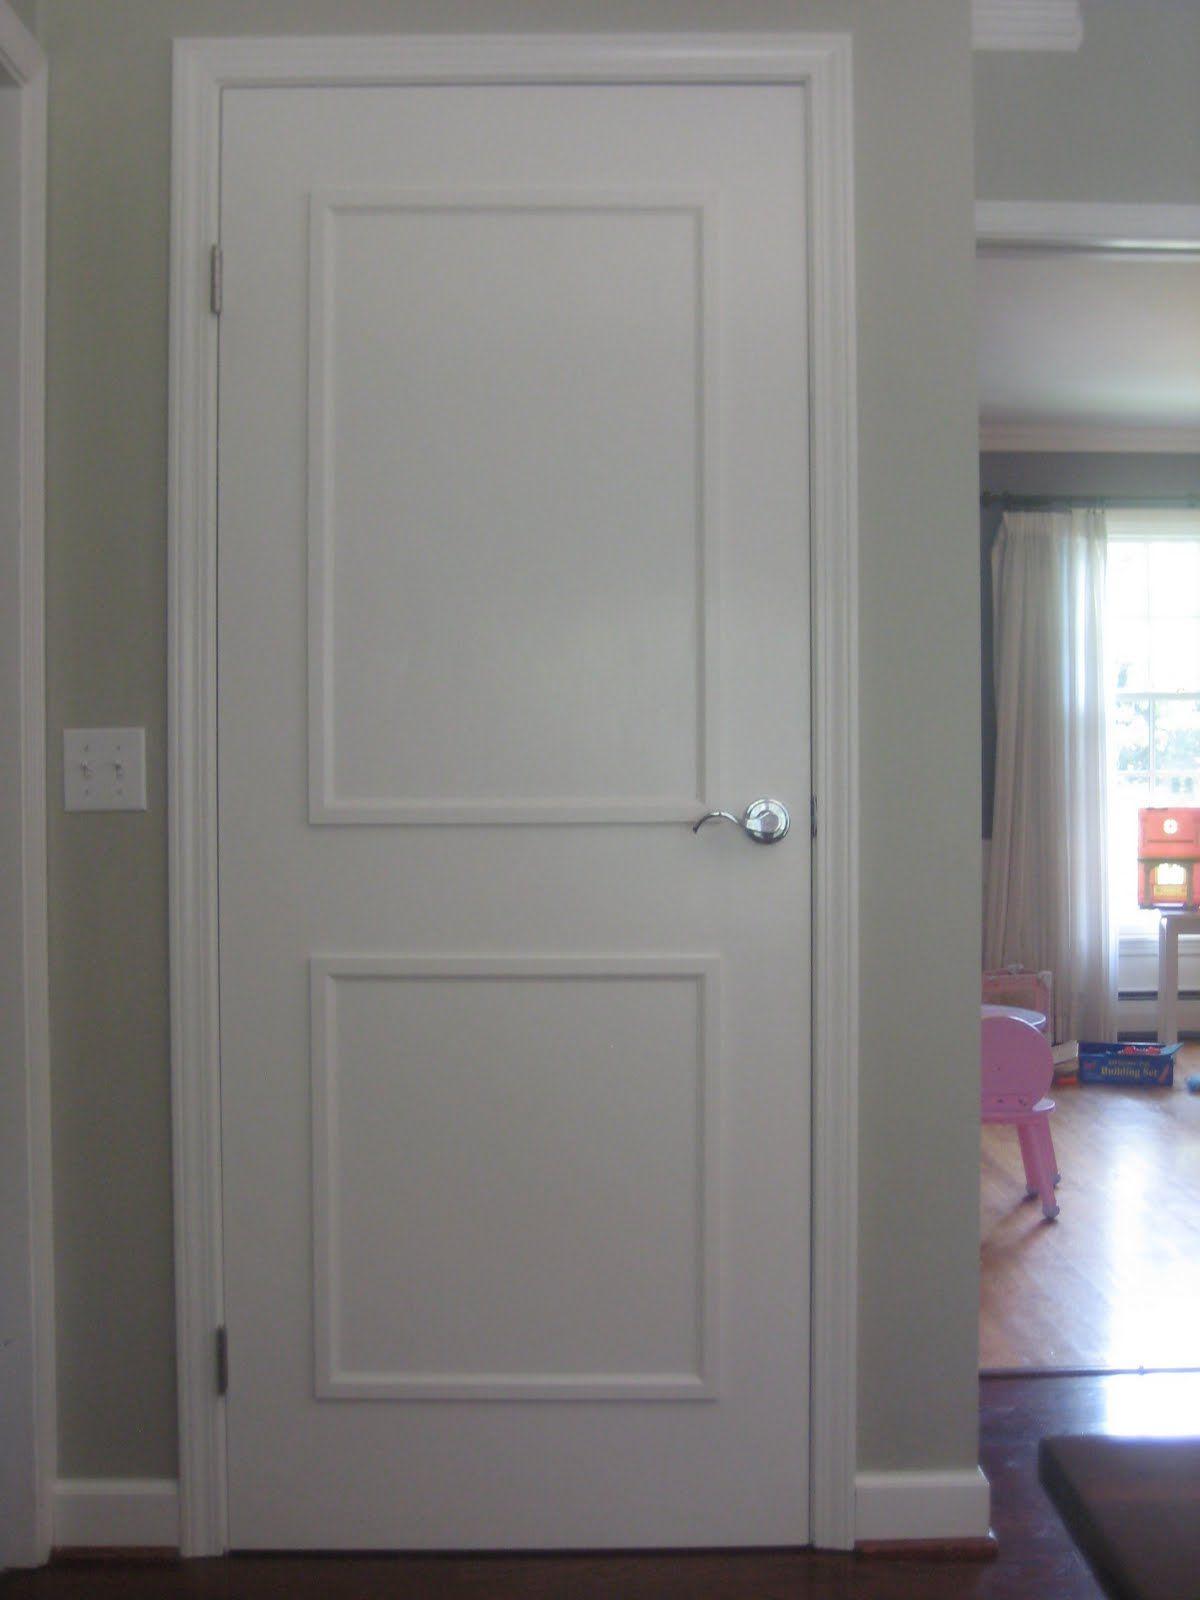 where buy grand door interior i org l main storm handballtunisie can steel lowes doors designs